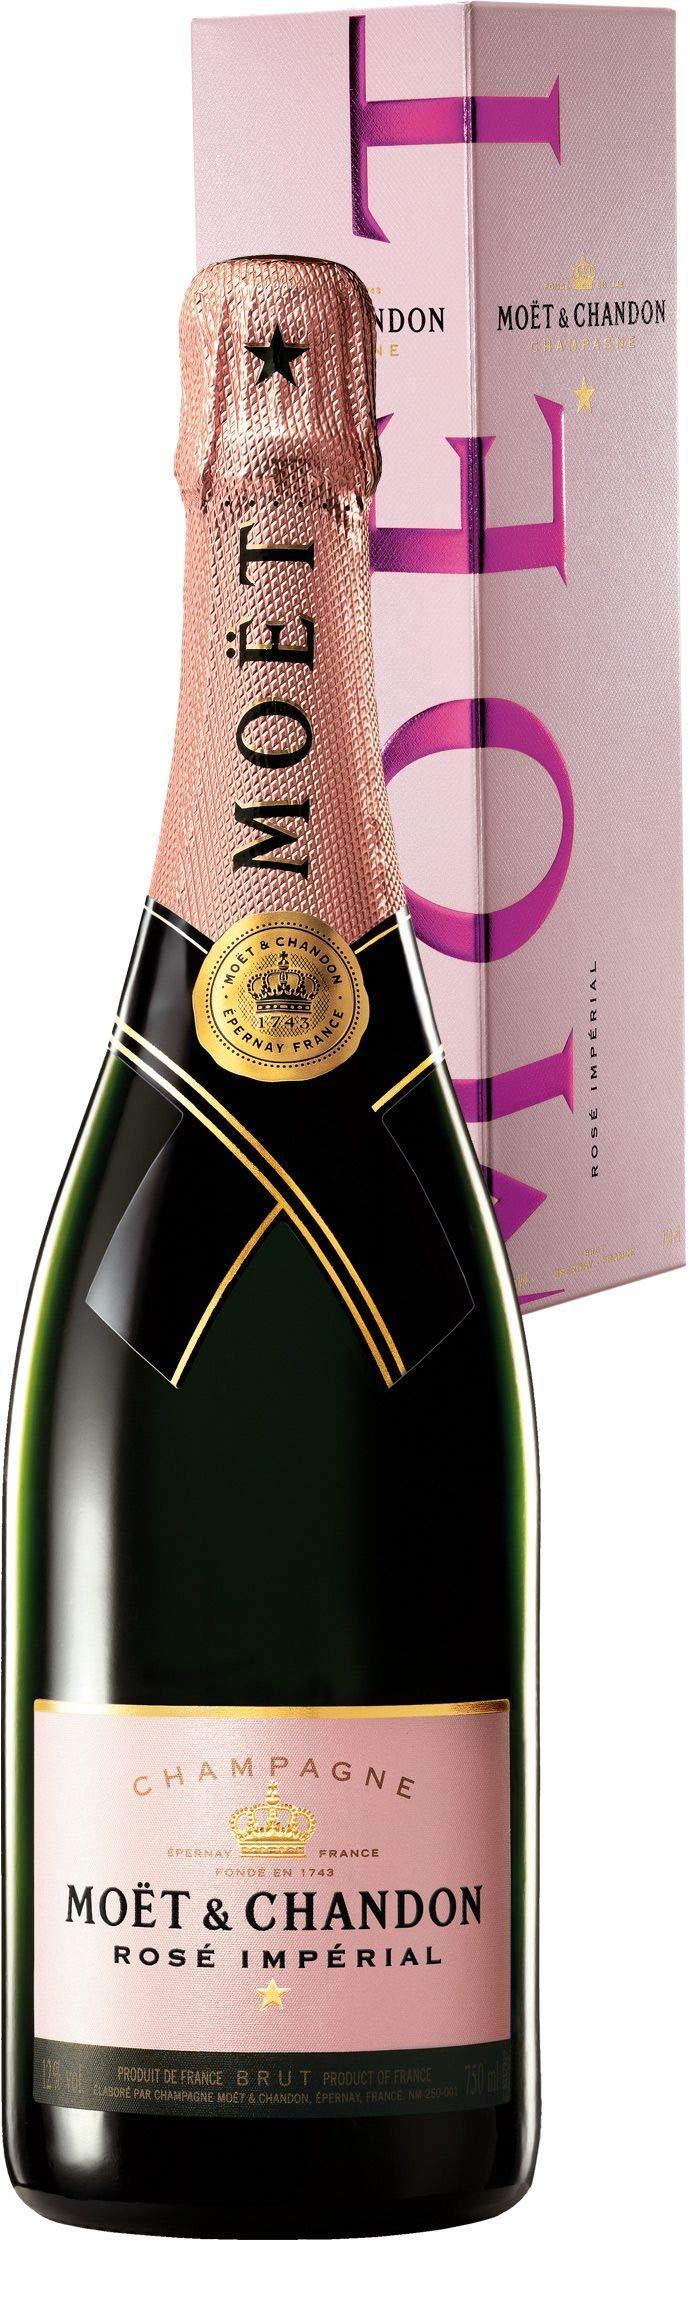 Mot-Chandon-Brut-Ros-Imprial-in-Geschenkverpackung-extra-brut-075-L-Flaschen